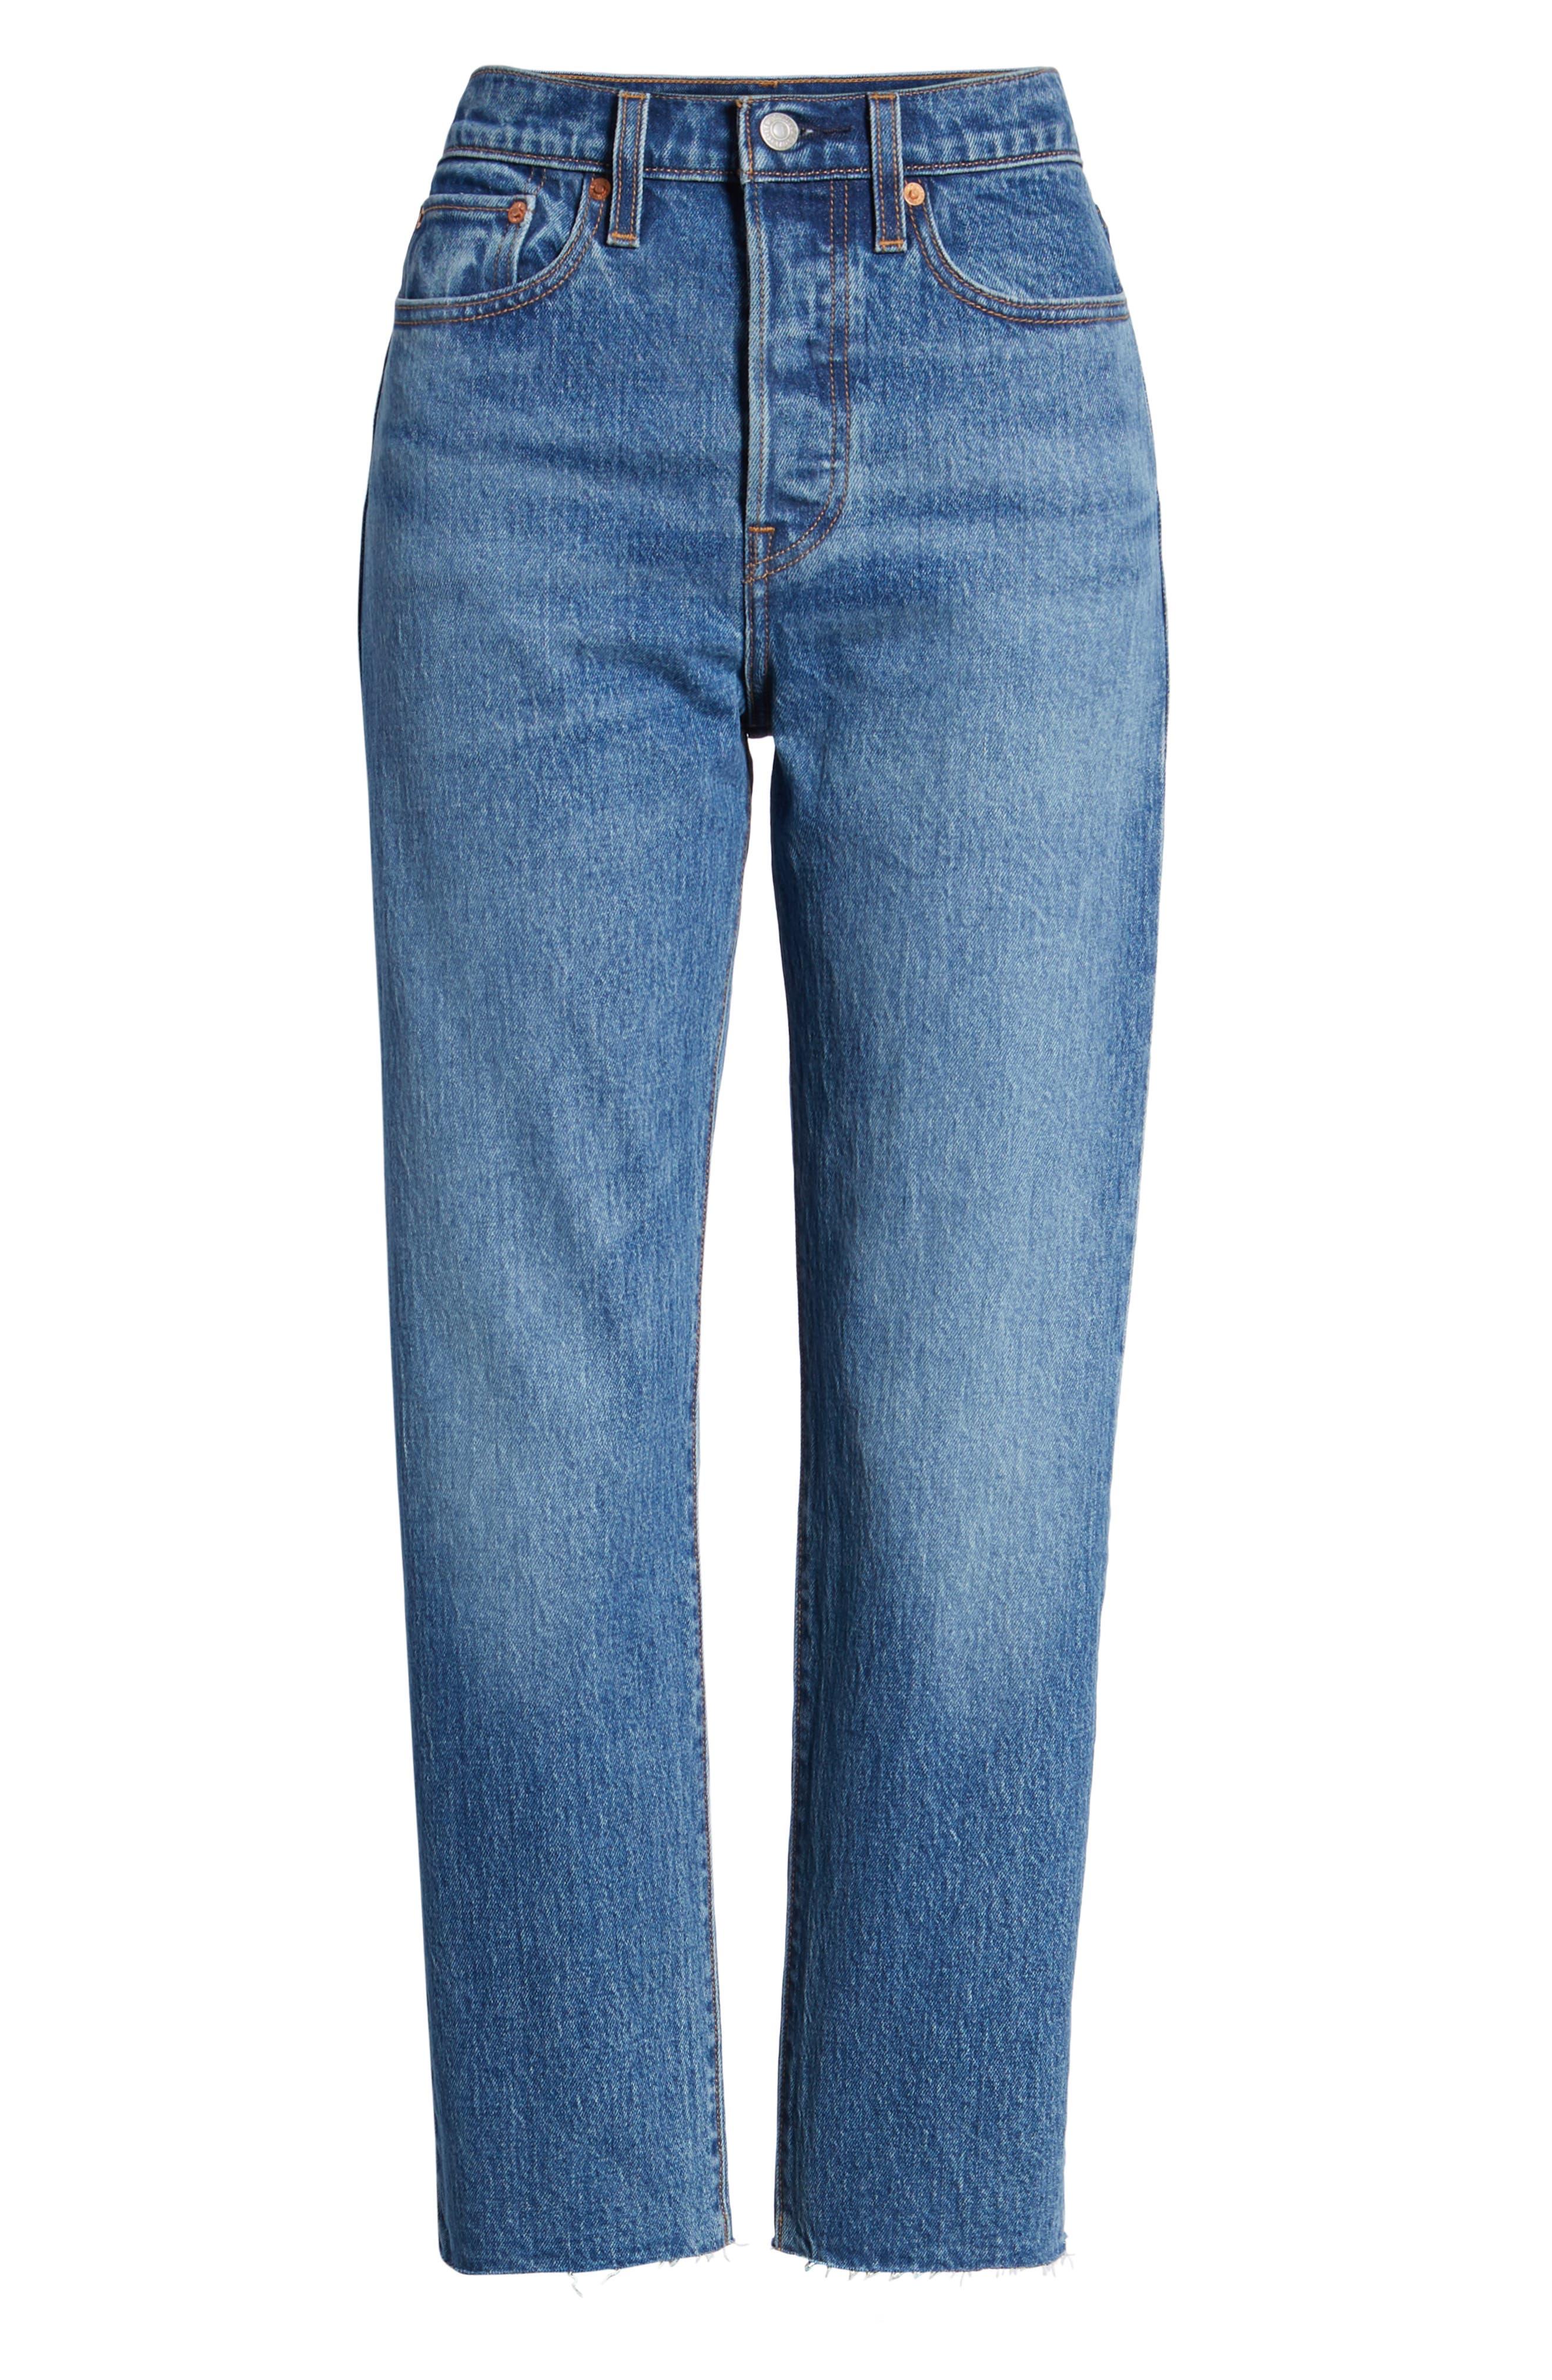 LEVI'S<SUP>®</SUP>, Wedgie Raw Hem High Waist Straight Leg Jeans, Alternate thumbnail 7, color, LOVE TRIANGLE